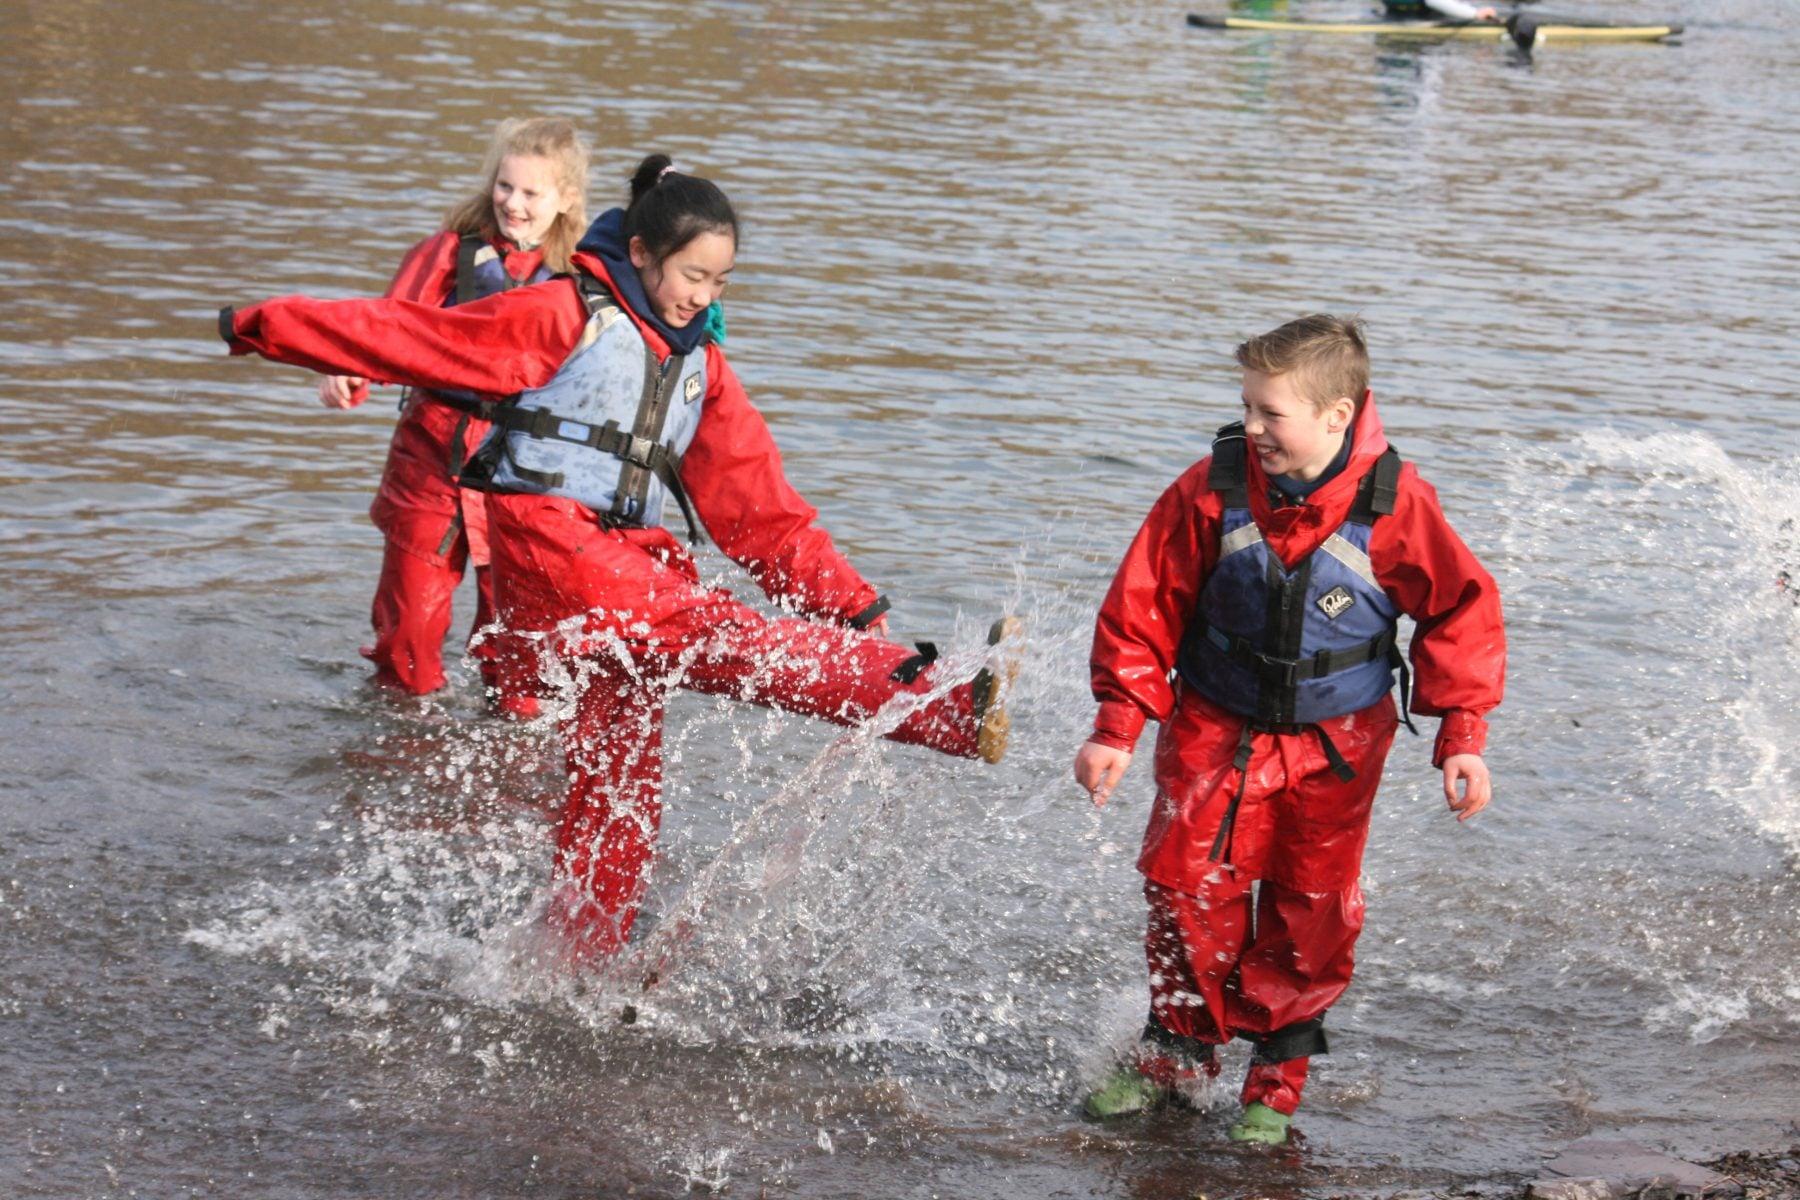 primary school pupils kicking water on outdoor activity